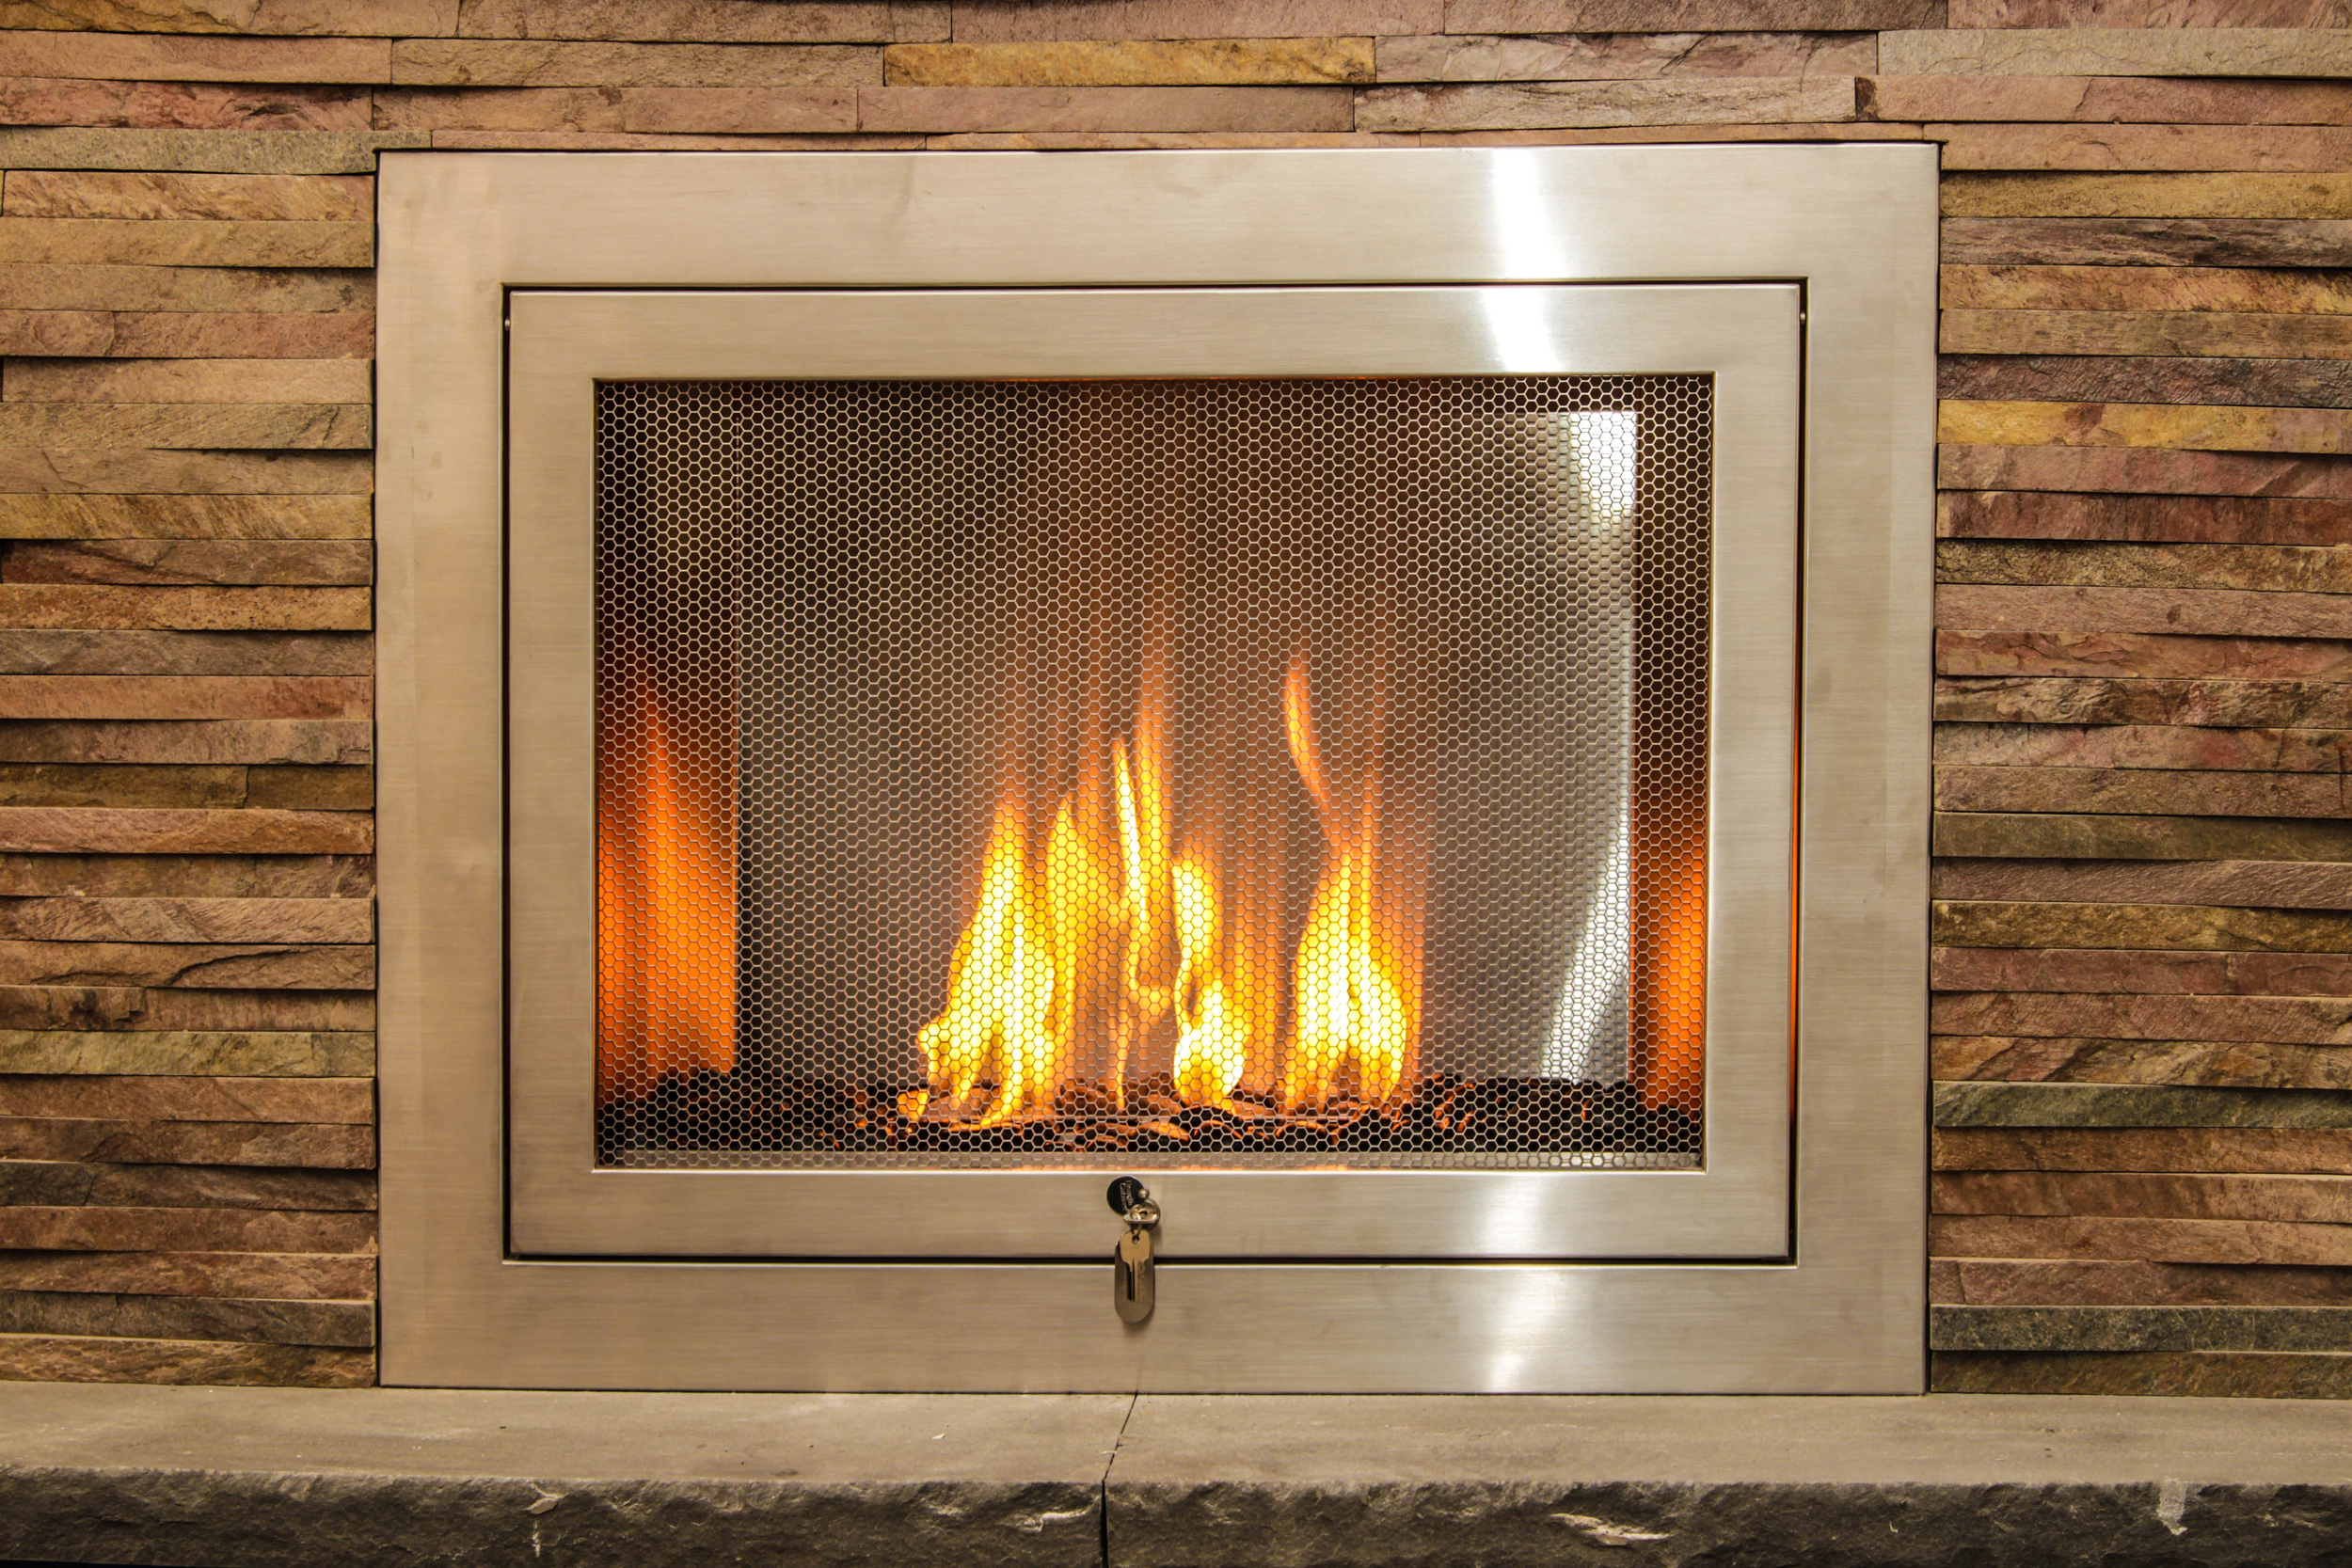 Vent free fireplace safety